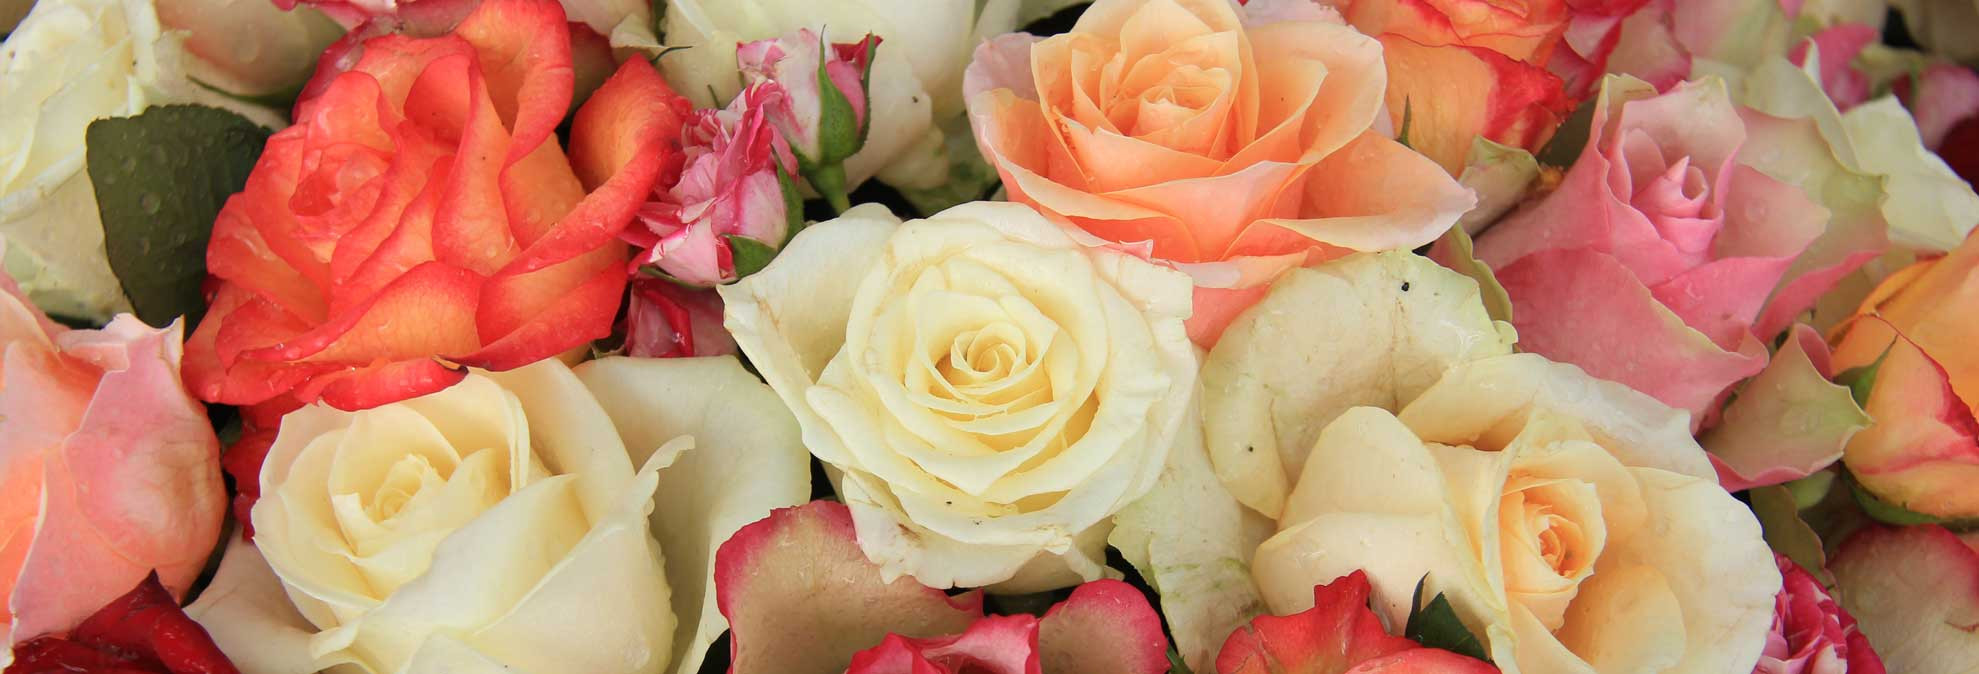 Vase for Long Stem Flowers Of ordering Flowers Online Consumer Reports for Cr Money Hero Flower Delivery 04 16